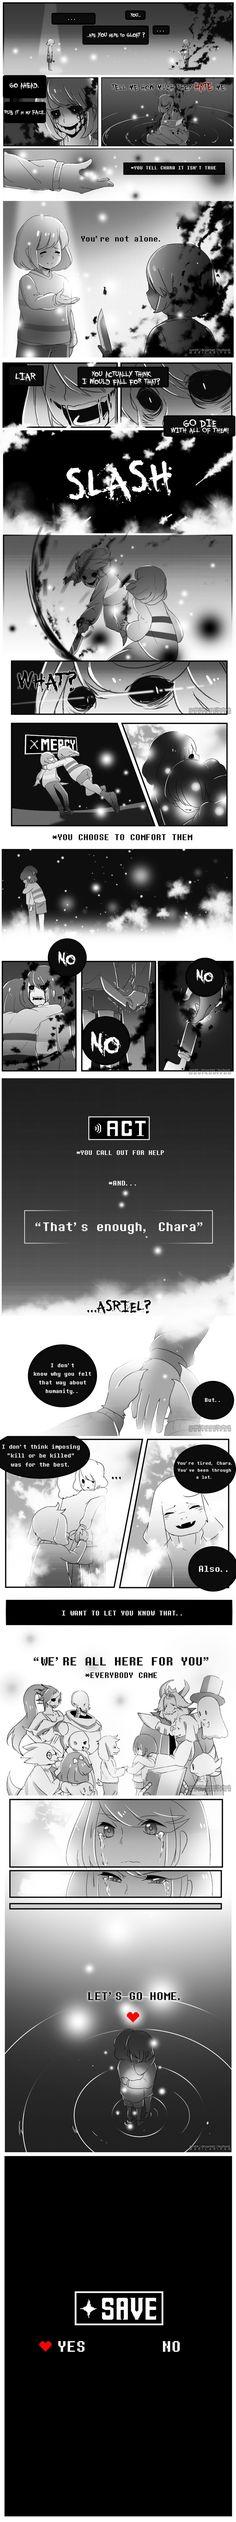 Undertale Comic : SAVE CHARA by maricaripan.deviantart.com on @DeviantArt